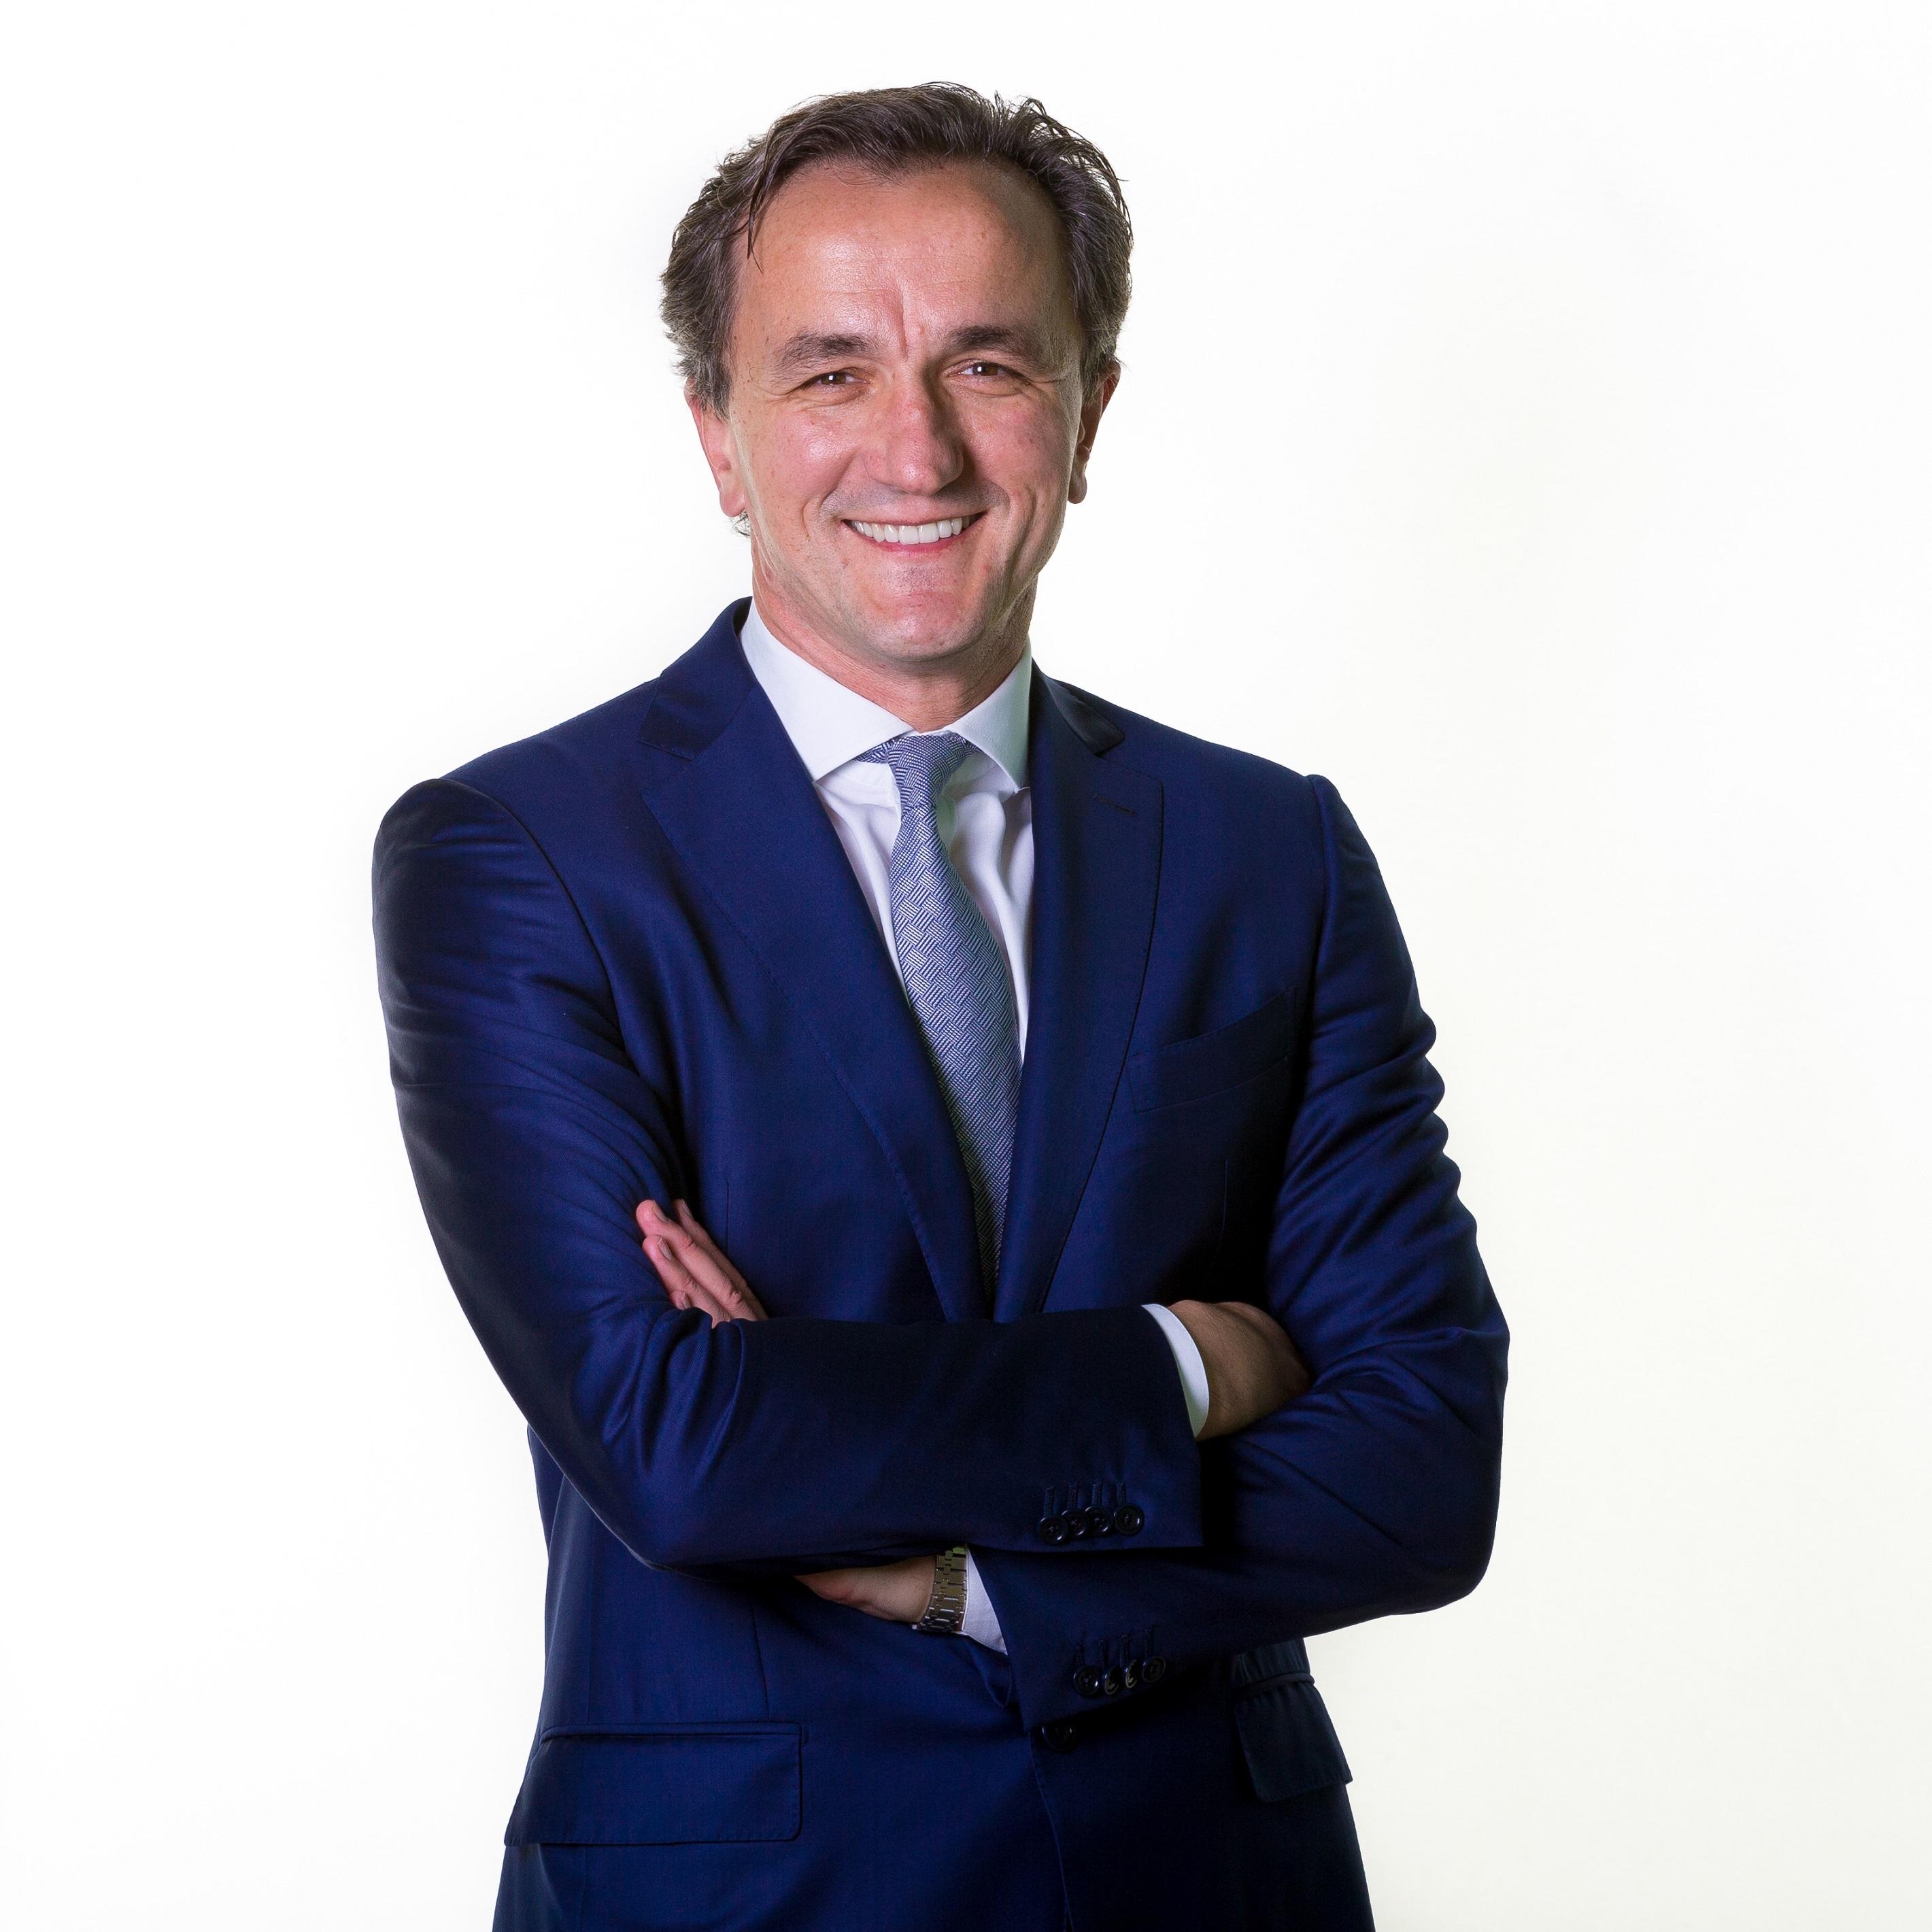 mihaljevic tomislav ceo cleveland clinic president tom doctor newsroom named croatian dr hospital cosgrove jan